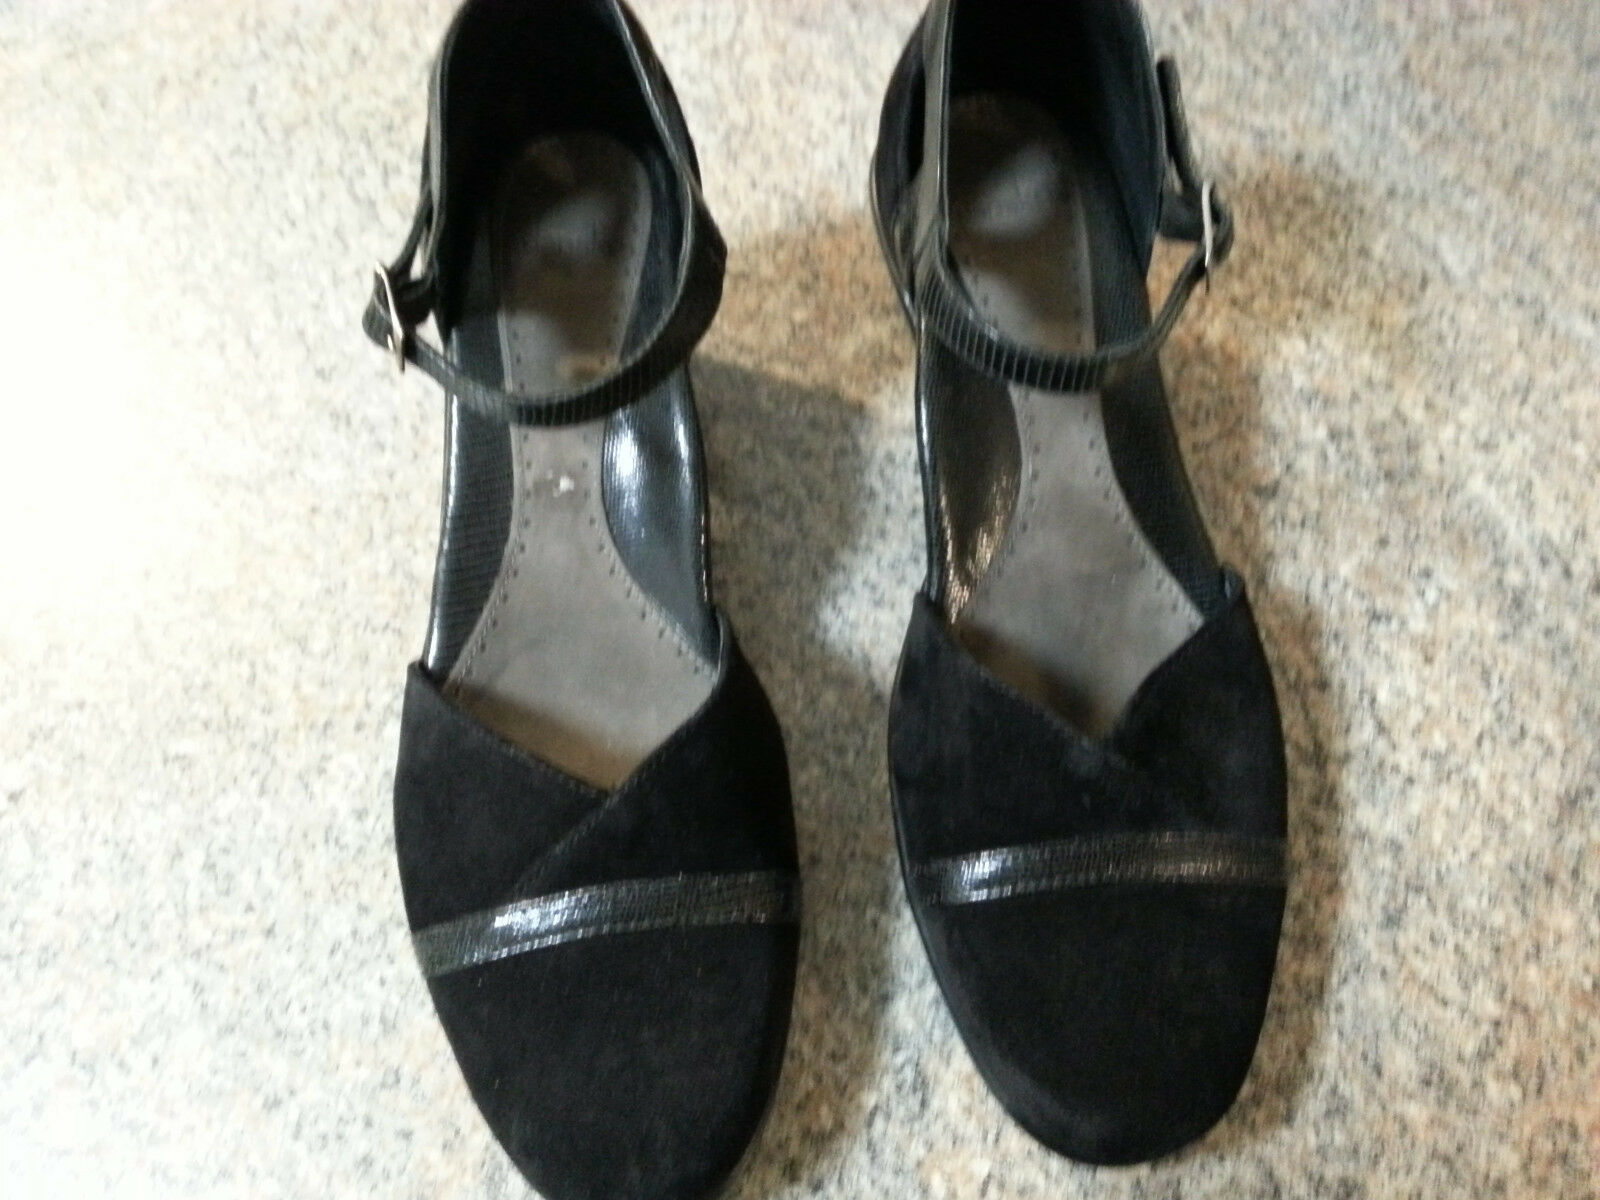 Dansko Roxy Size 41 US 10.5-11 Black Suede Suede Suede Ankle Strap Pumps EXC 48a7fa